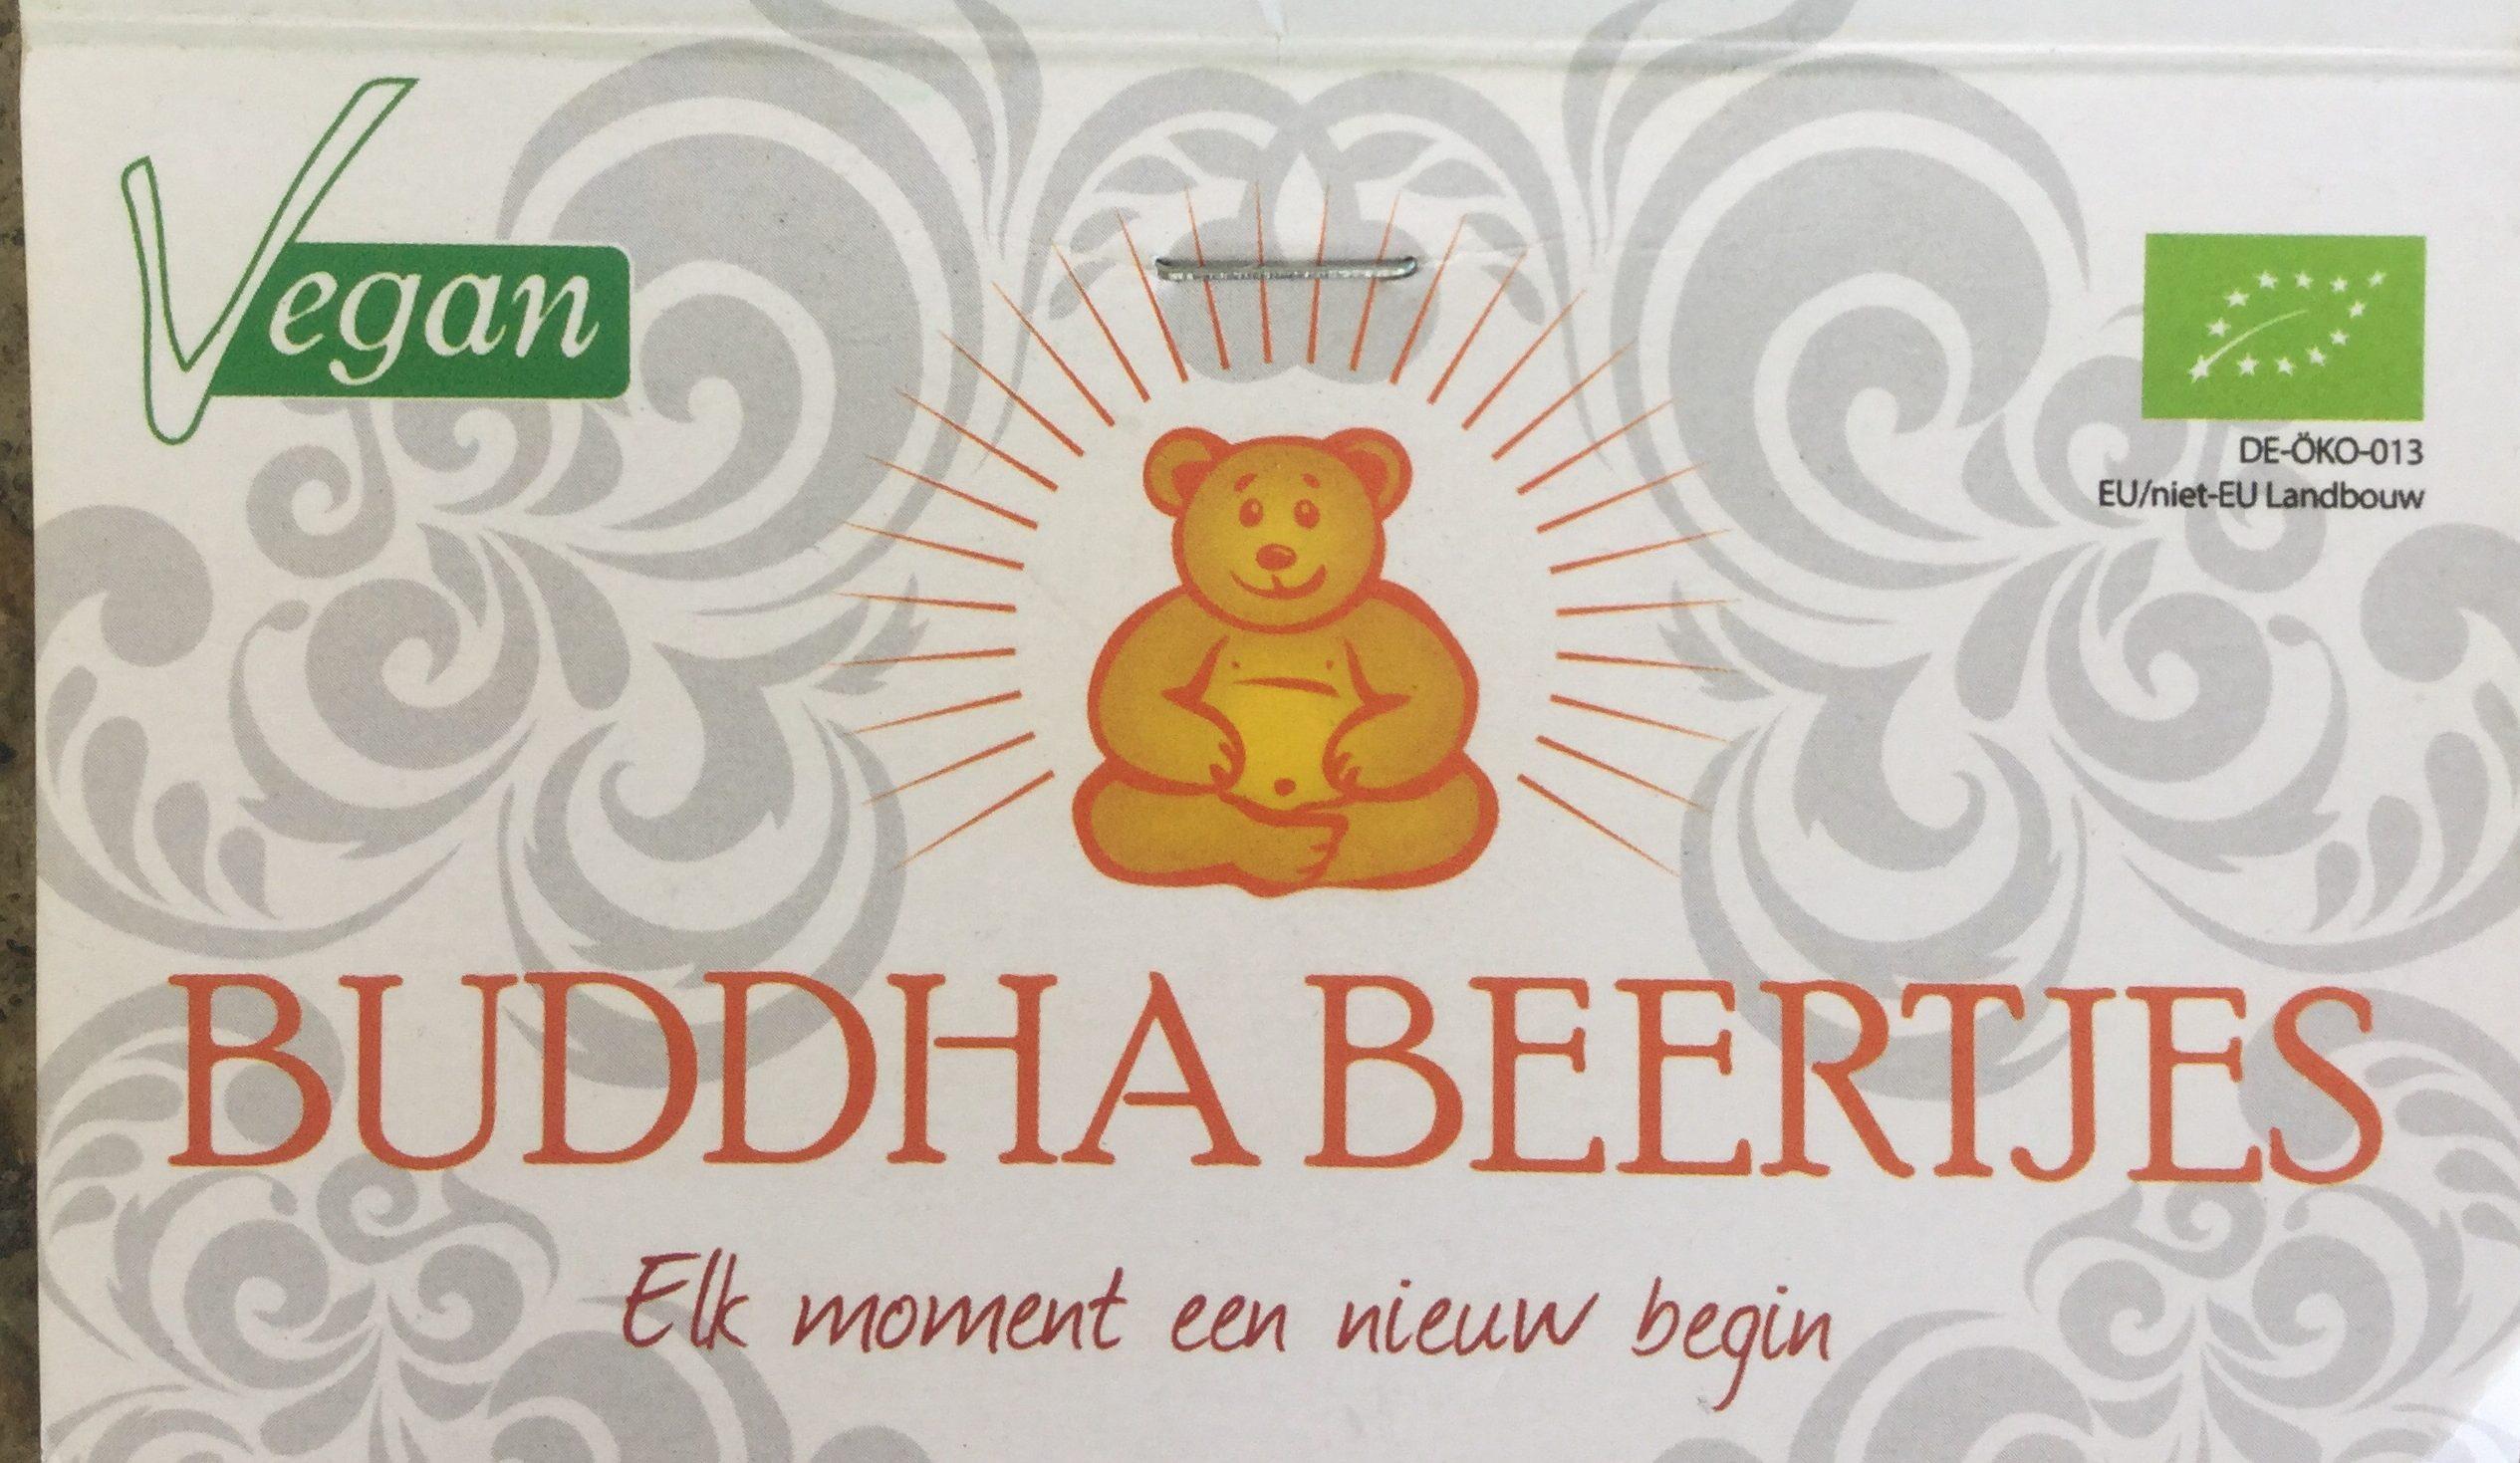 Buddha beertjes - Product - nl